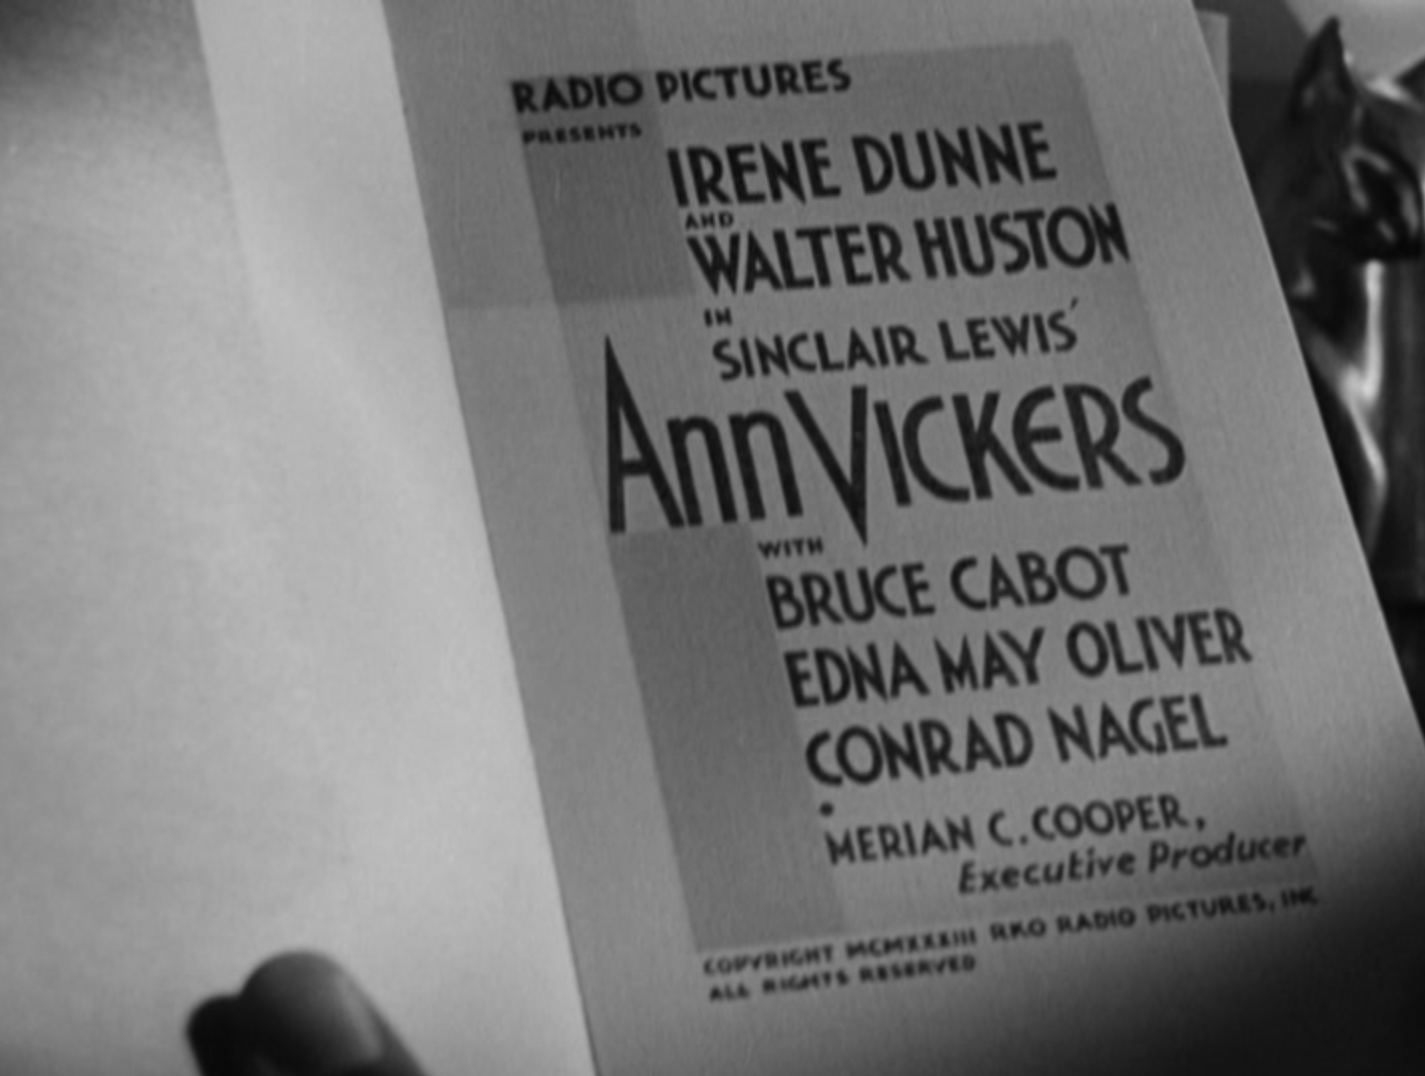 AnnVickers2